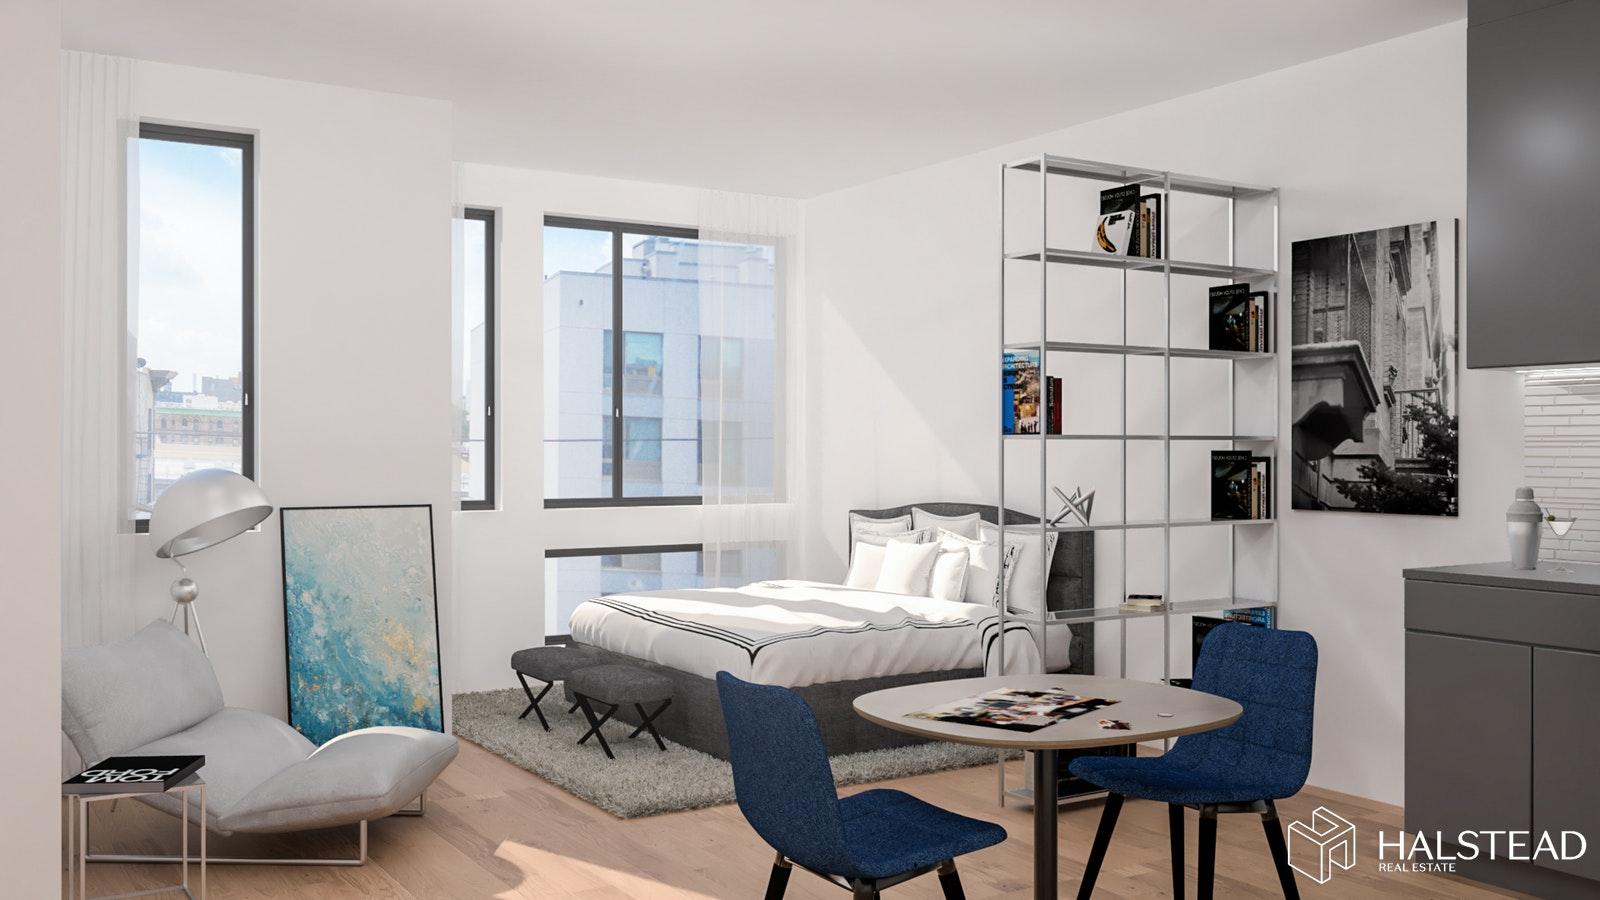 306 WEST 142ND STREET 4A, Central Harlem, $2,100, Web #: 19597401